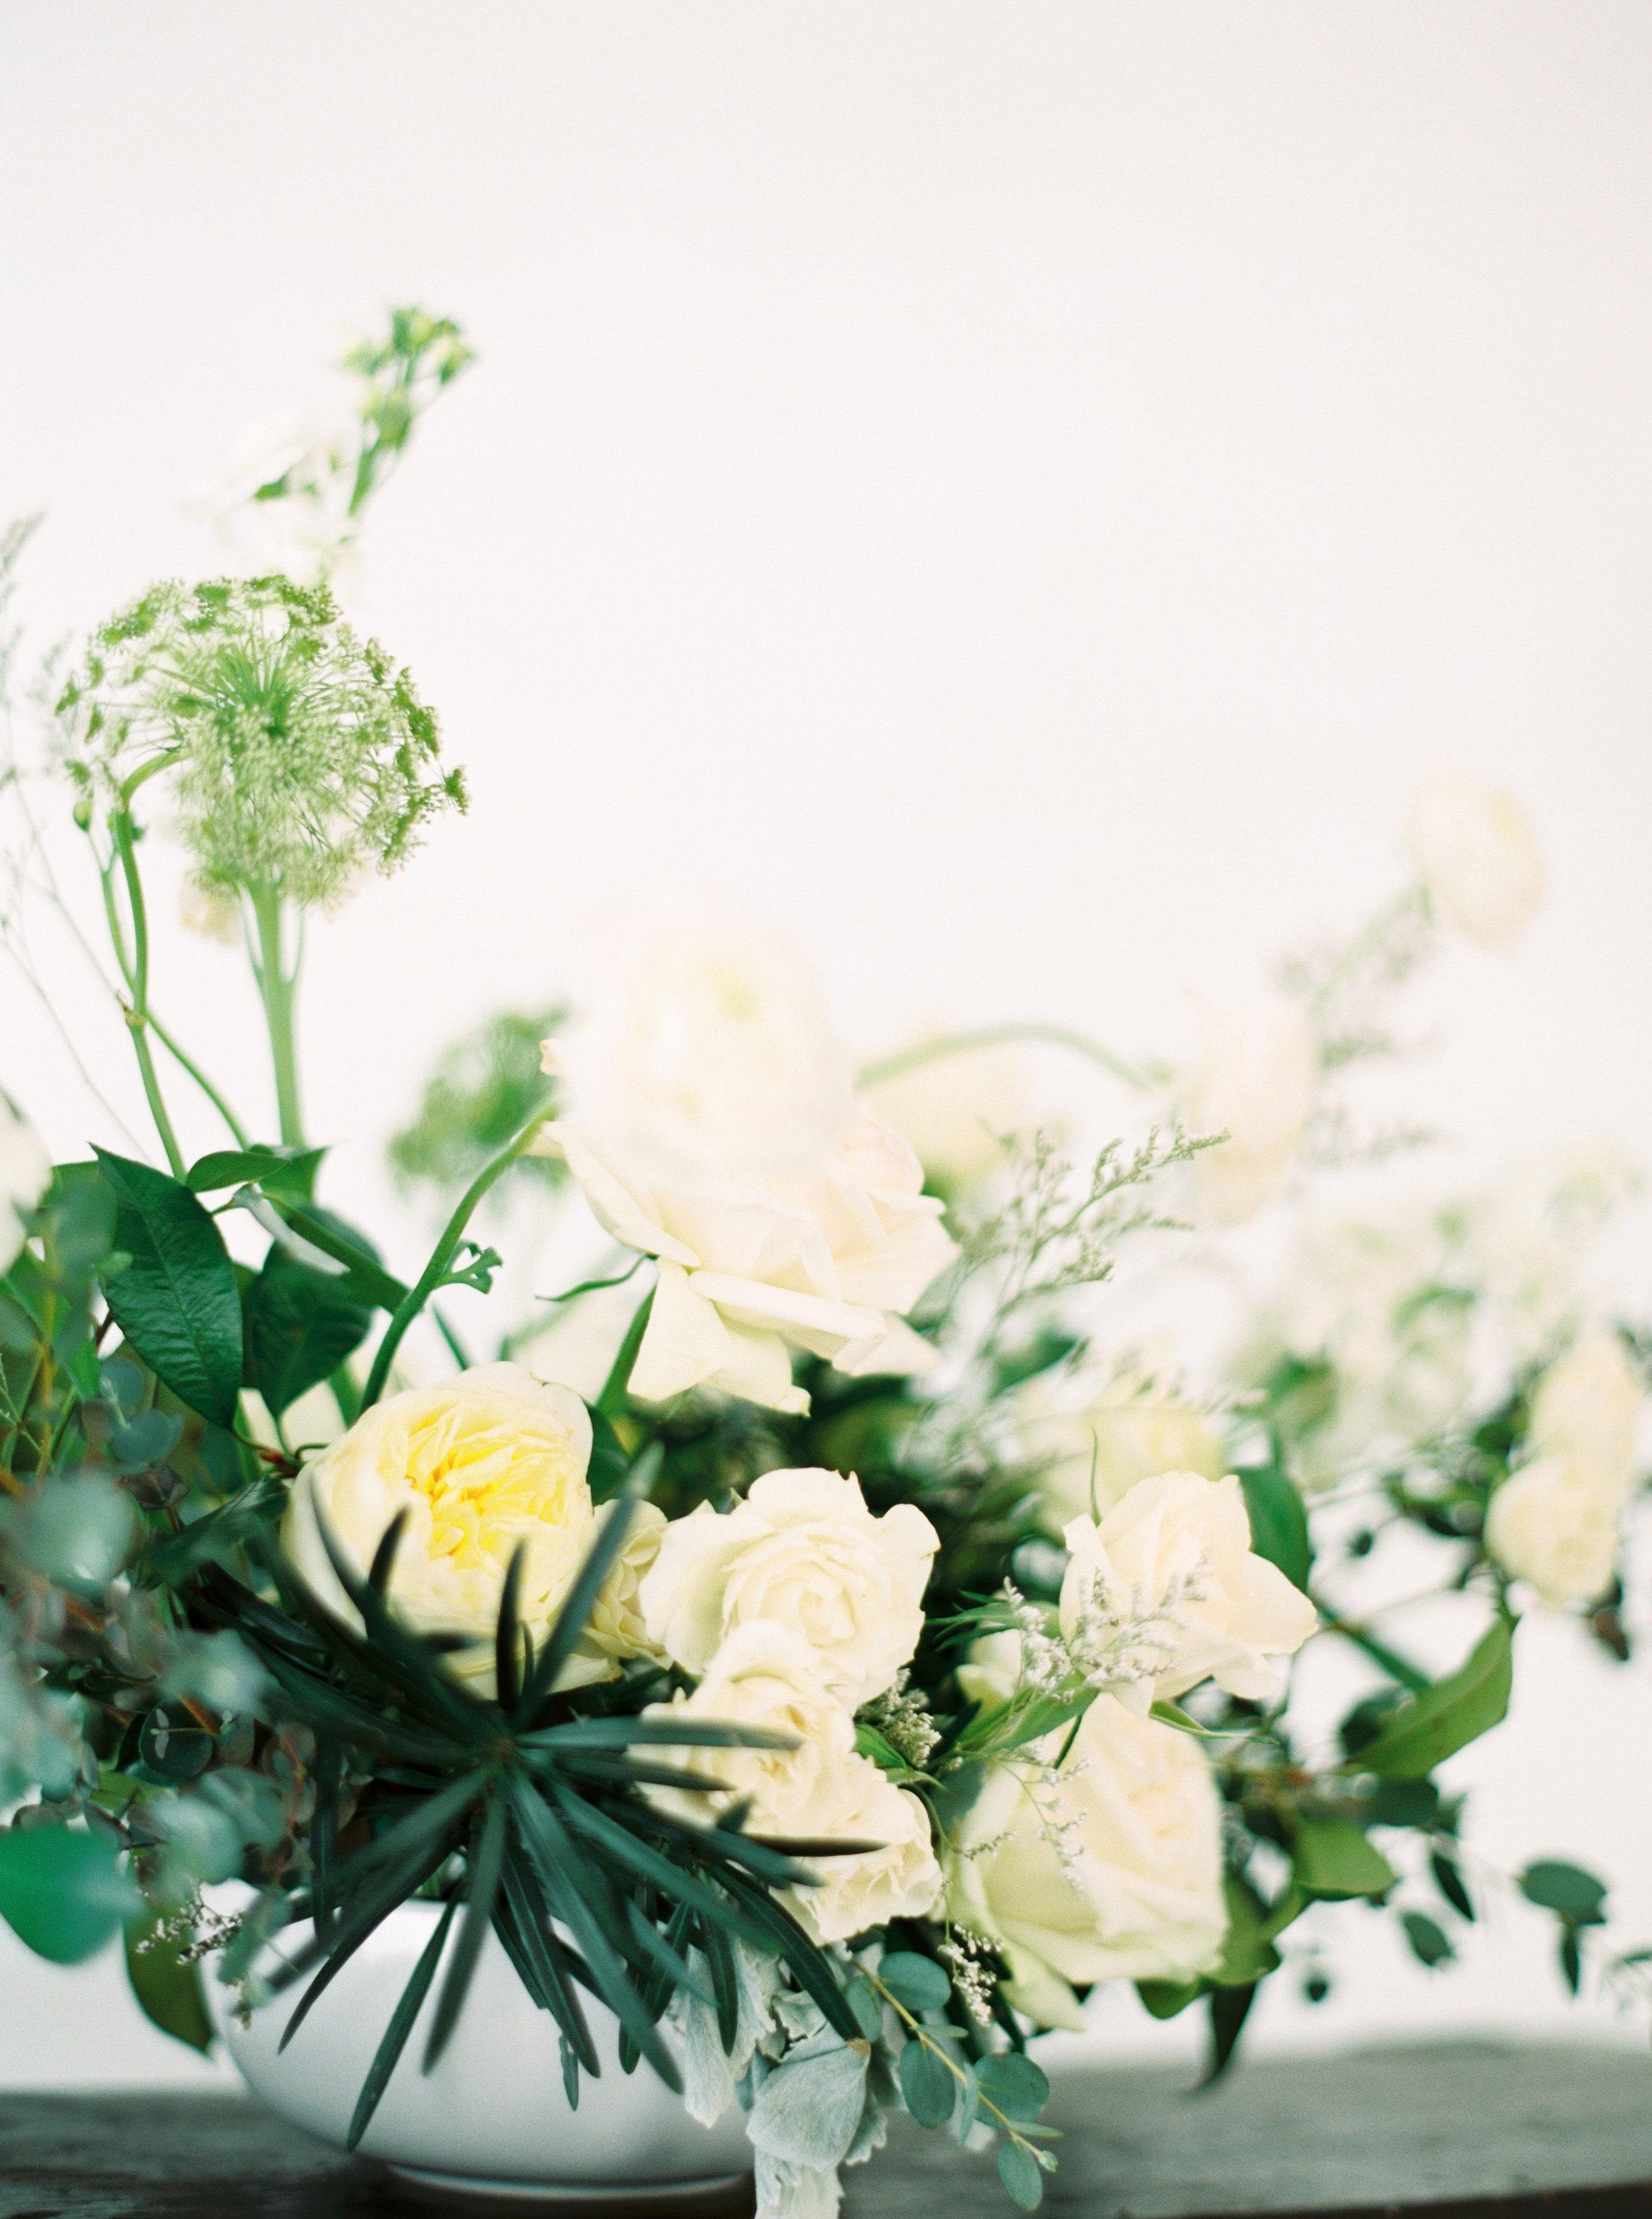 Owensboro Evansville Henderson Newburgh Wedding Flowers Florist00043.jpg